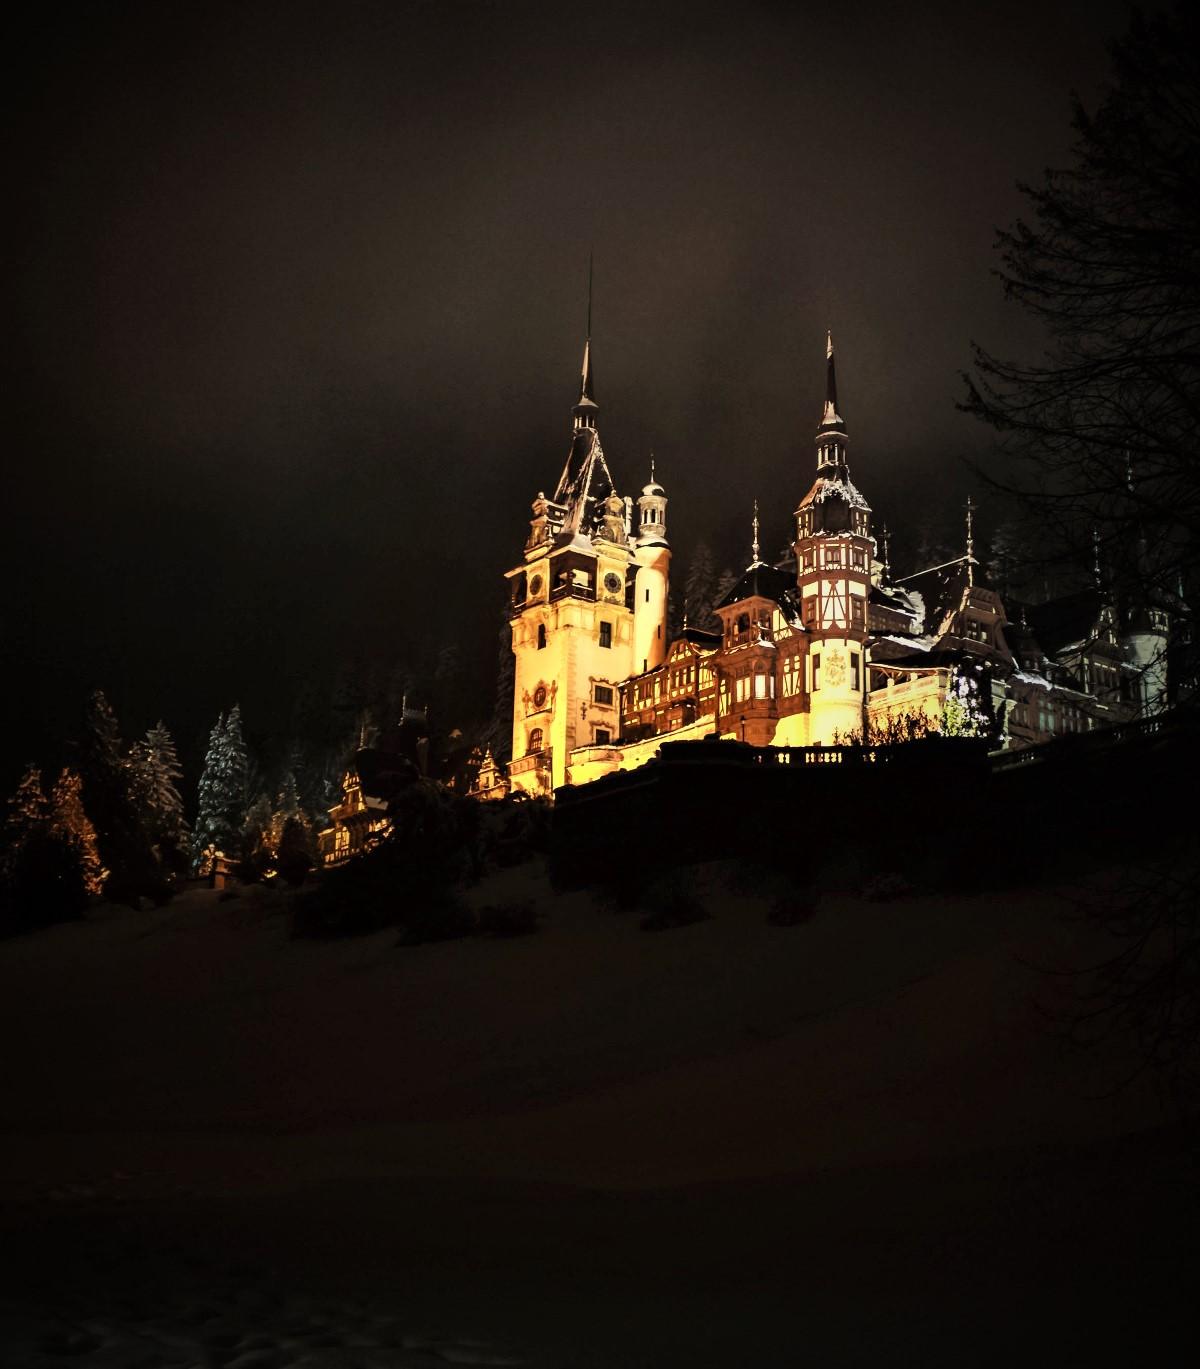 Peleş Castle. Credit Radueduard